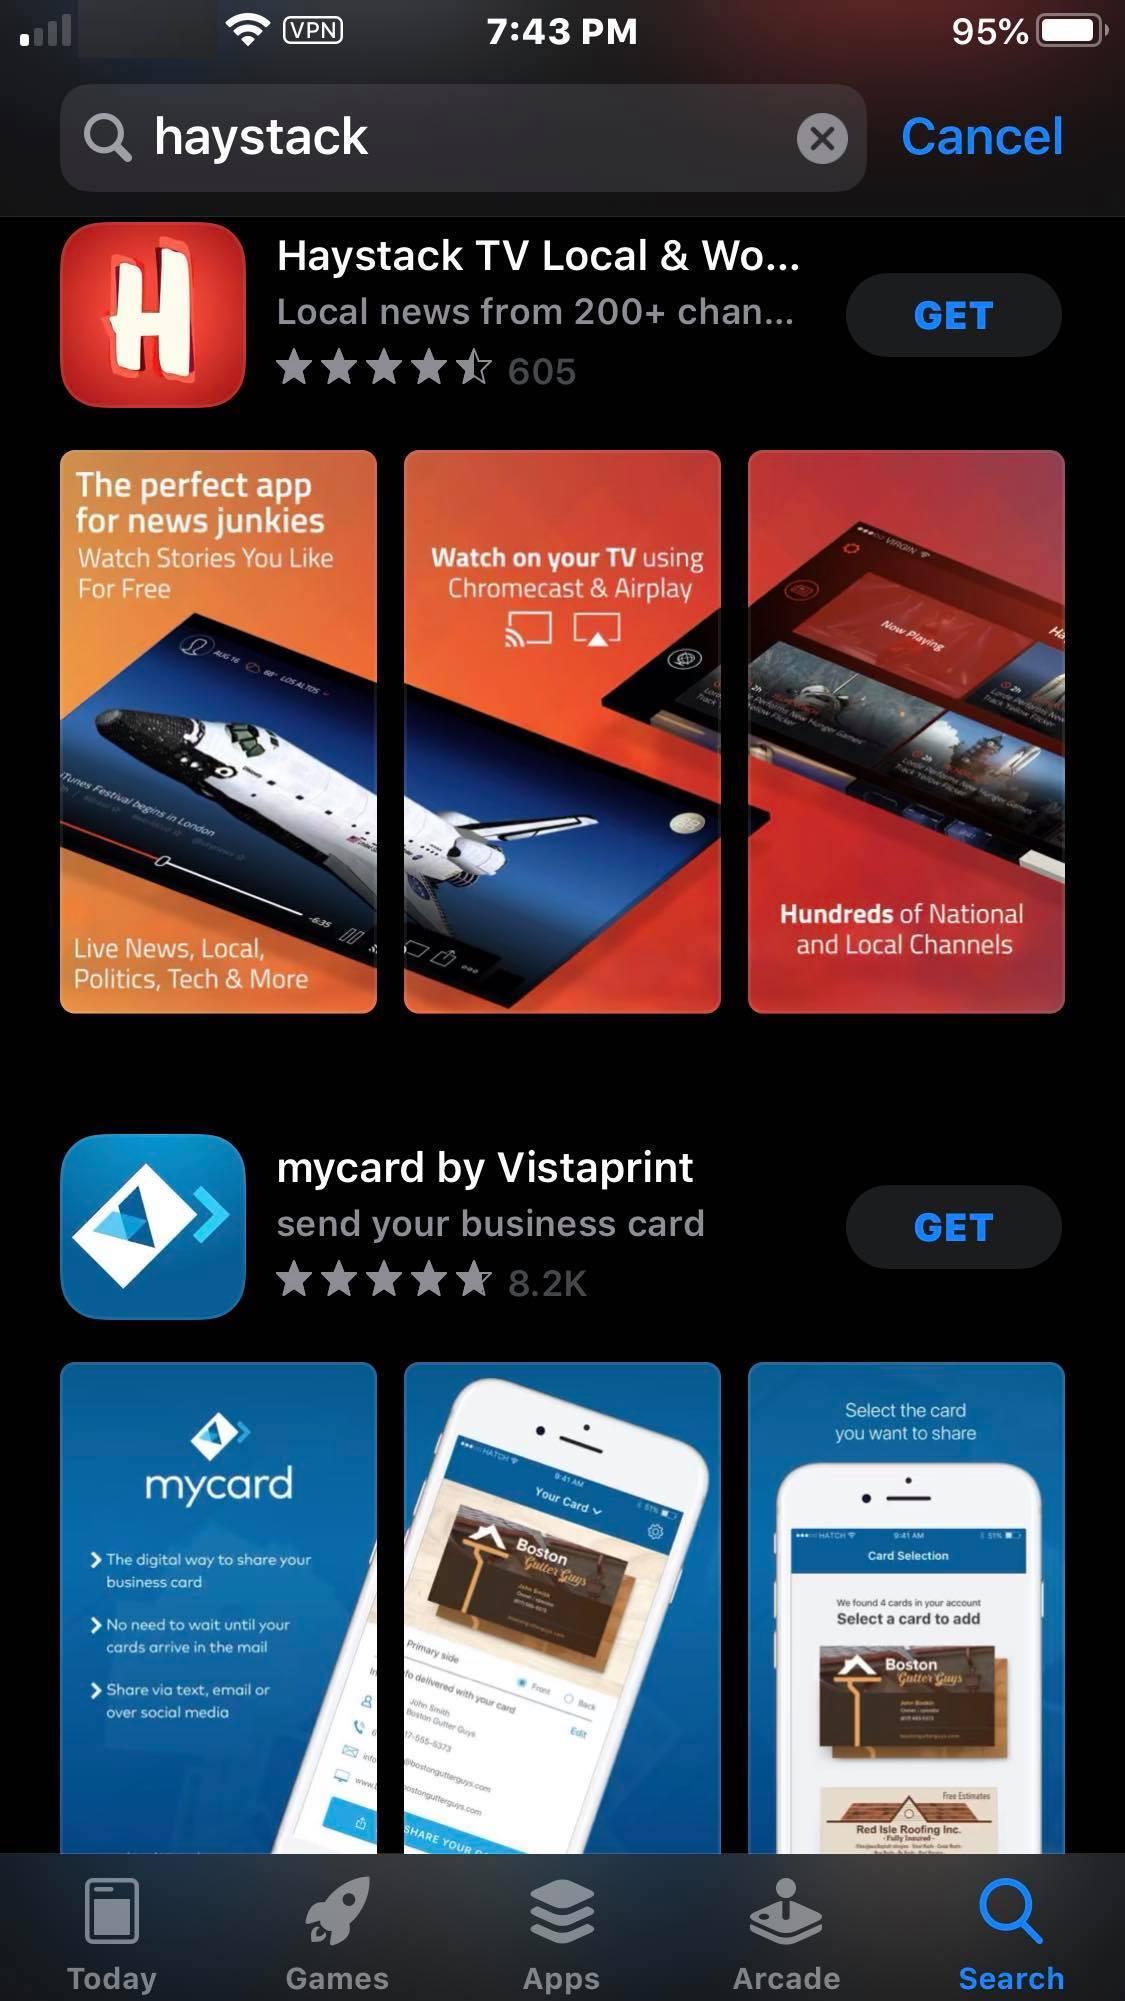 Step 2 - Haystack TV iOS Device Installation Guide